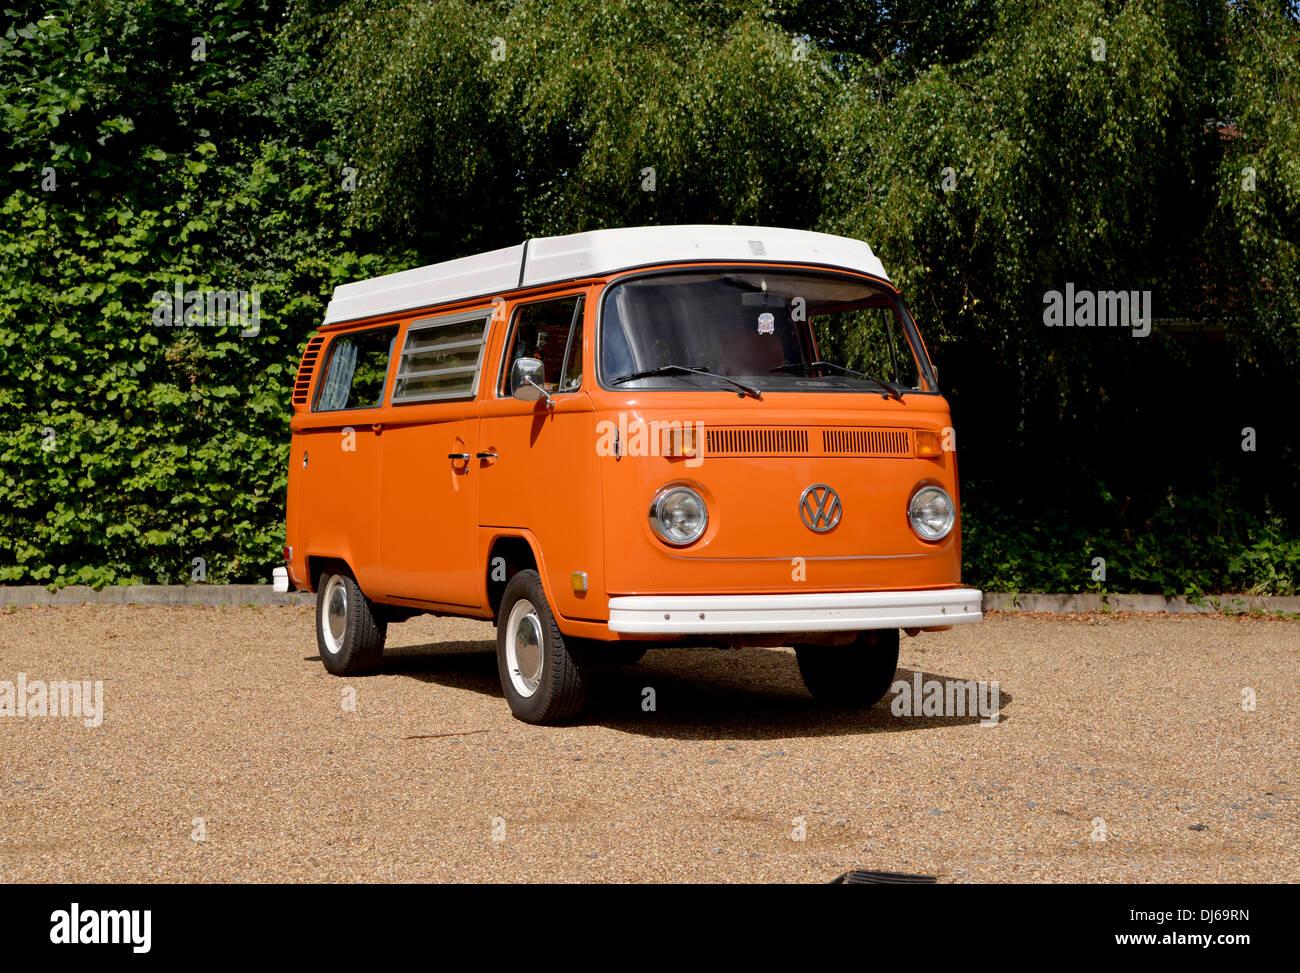 1974 vw type 2 bay window camper van micro bus westfalia. Black Bedroom Furniture Sets. Home Design Ideas